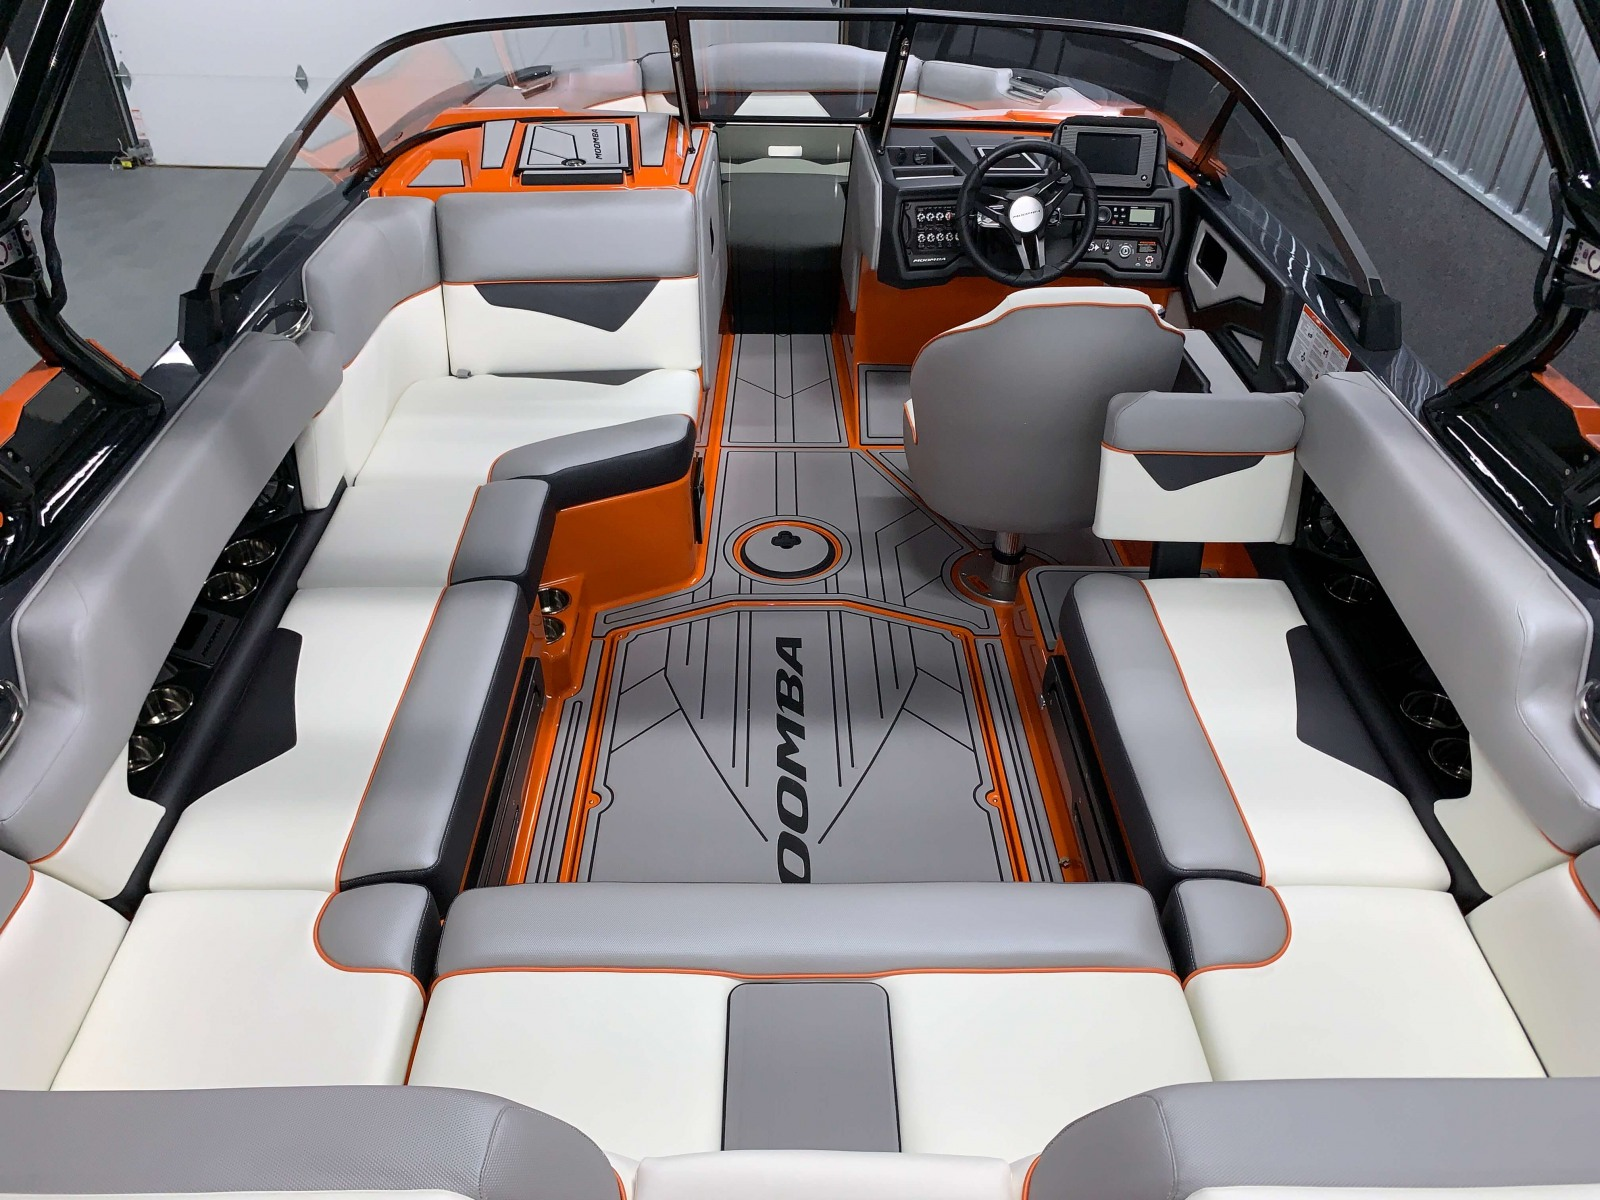 Interior Layout of the 2021 Moomba Kaiyen Wake Boat